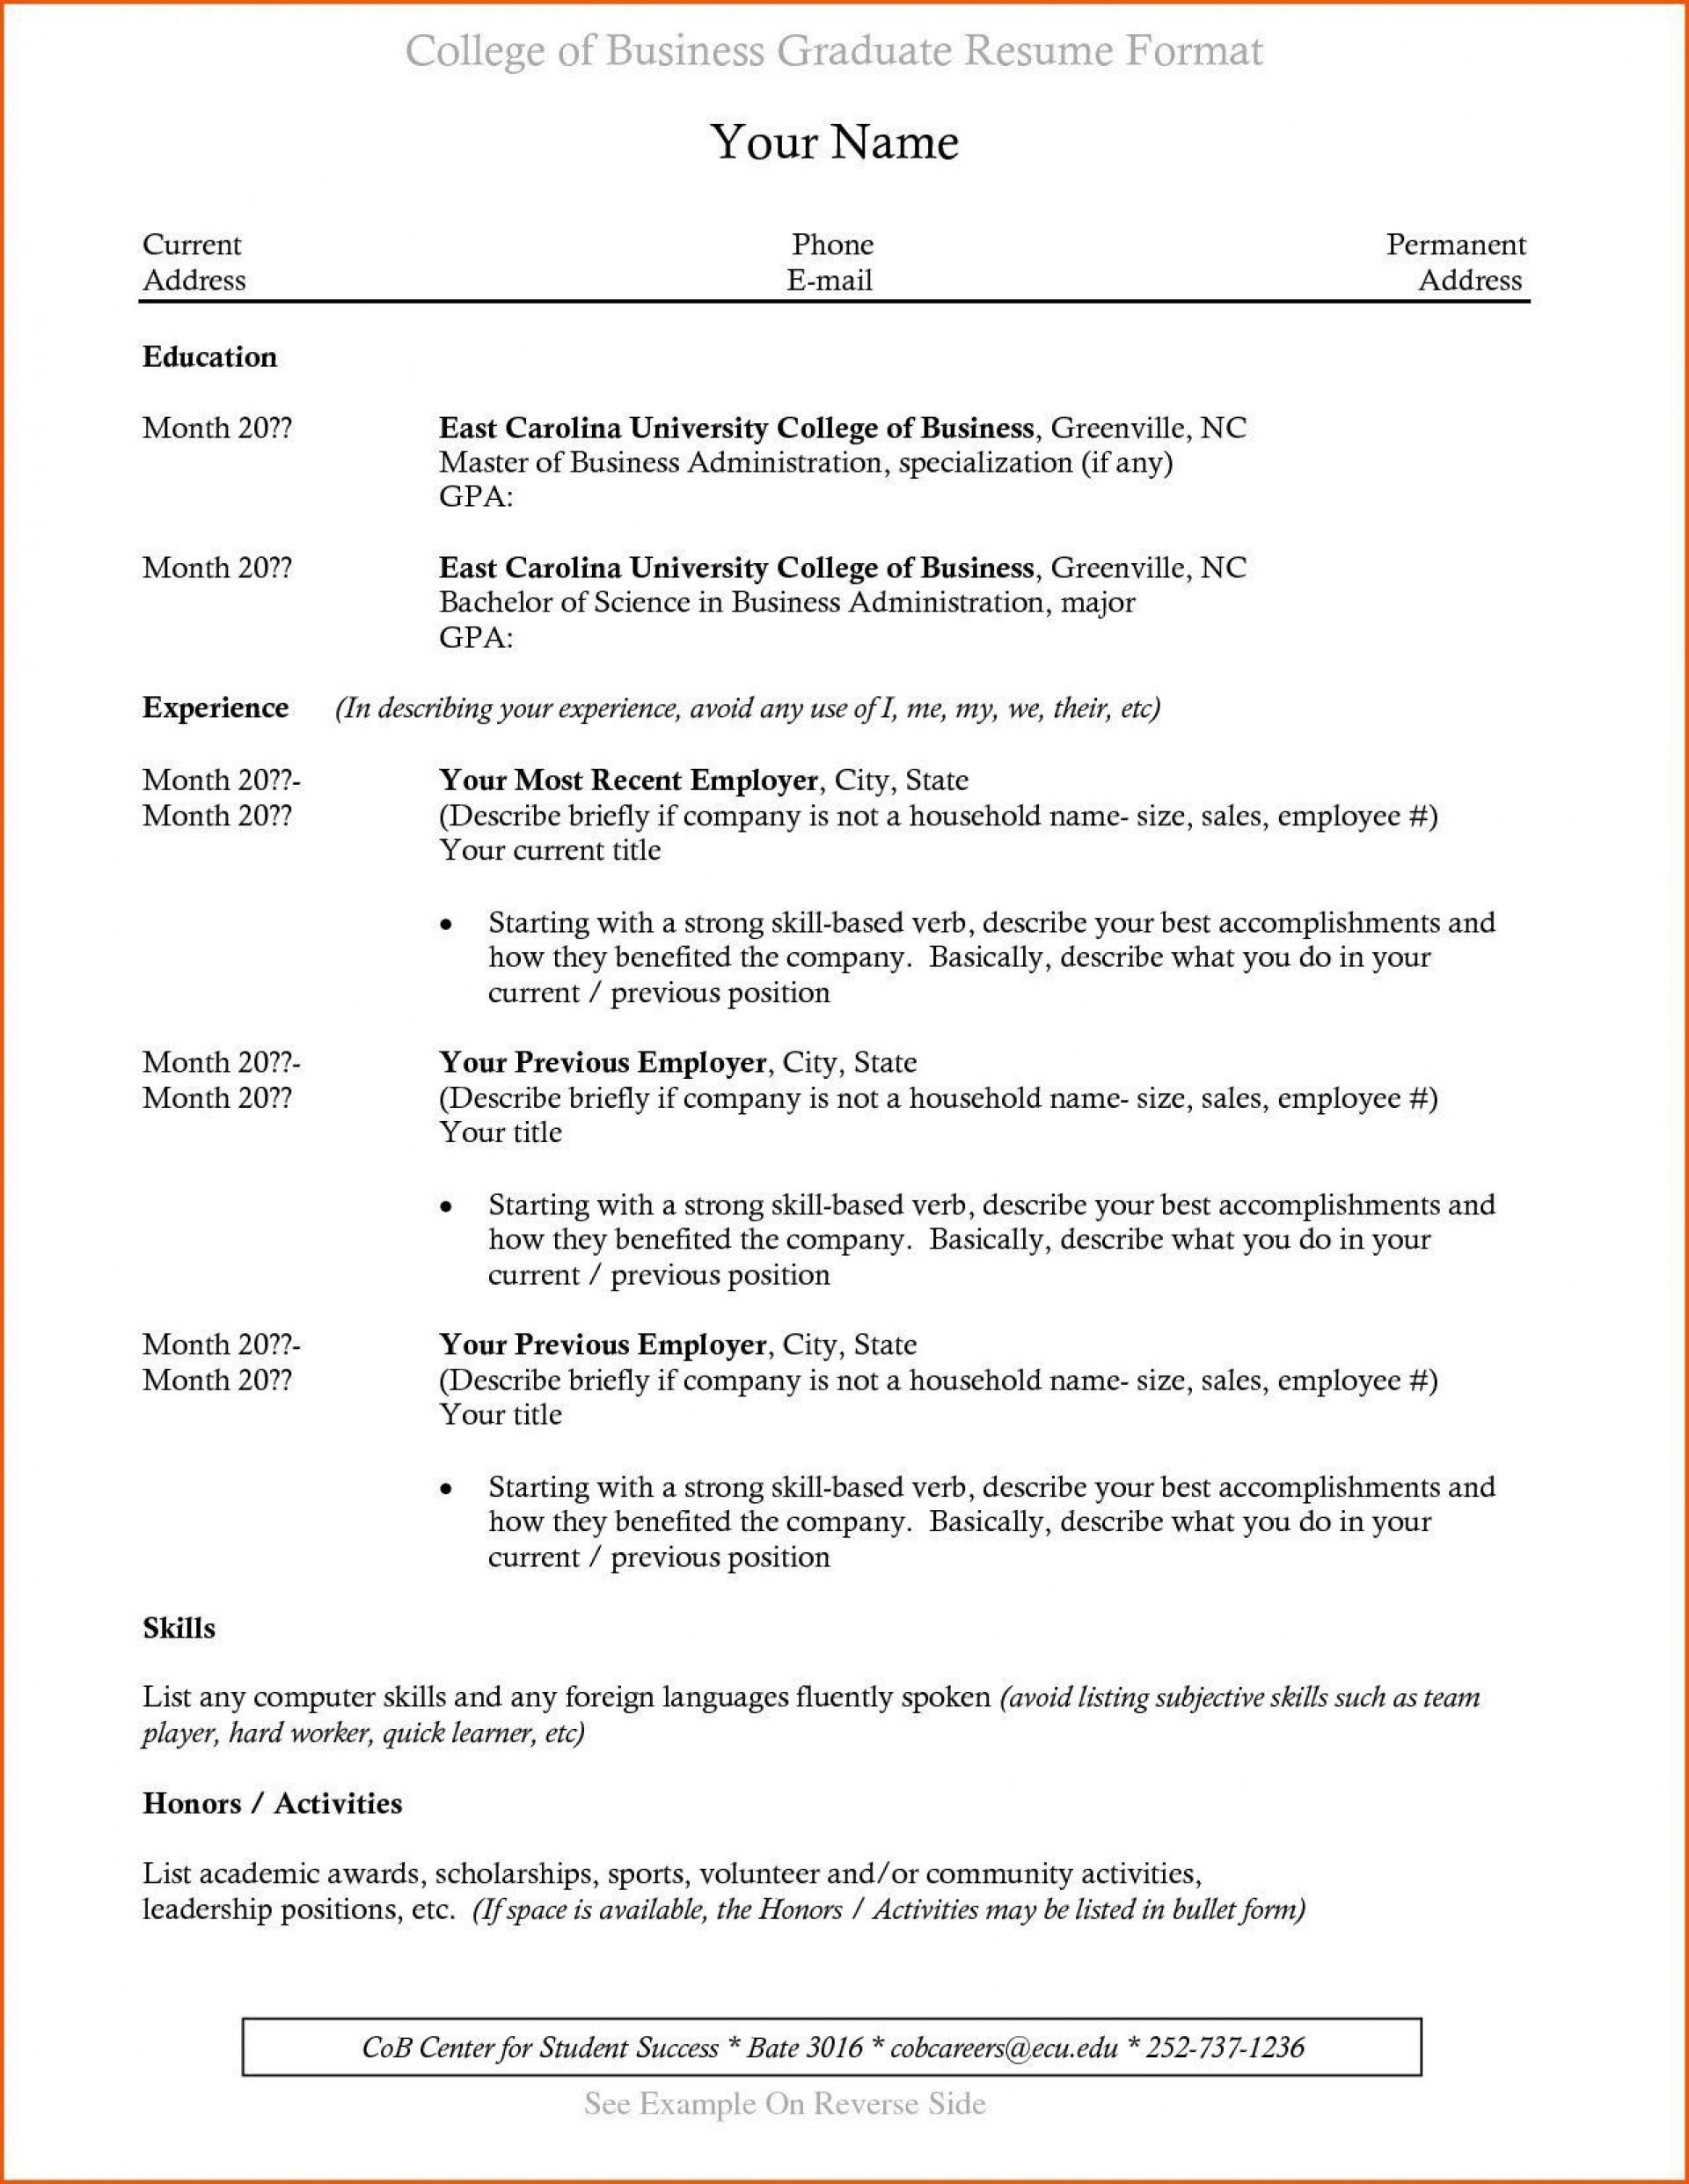 003 Incredible Recent College Graduate Resume Template Sample  Word1920